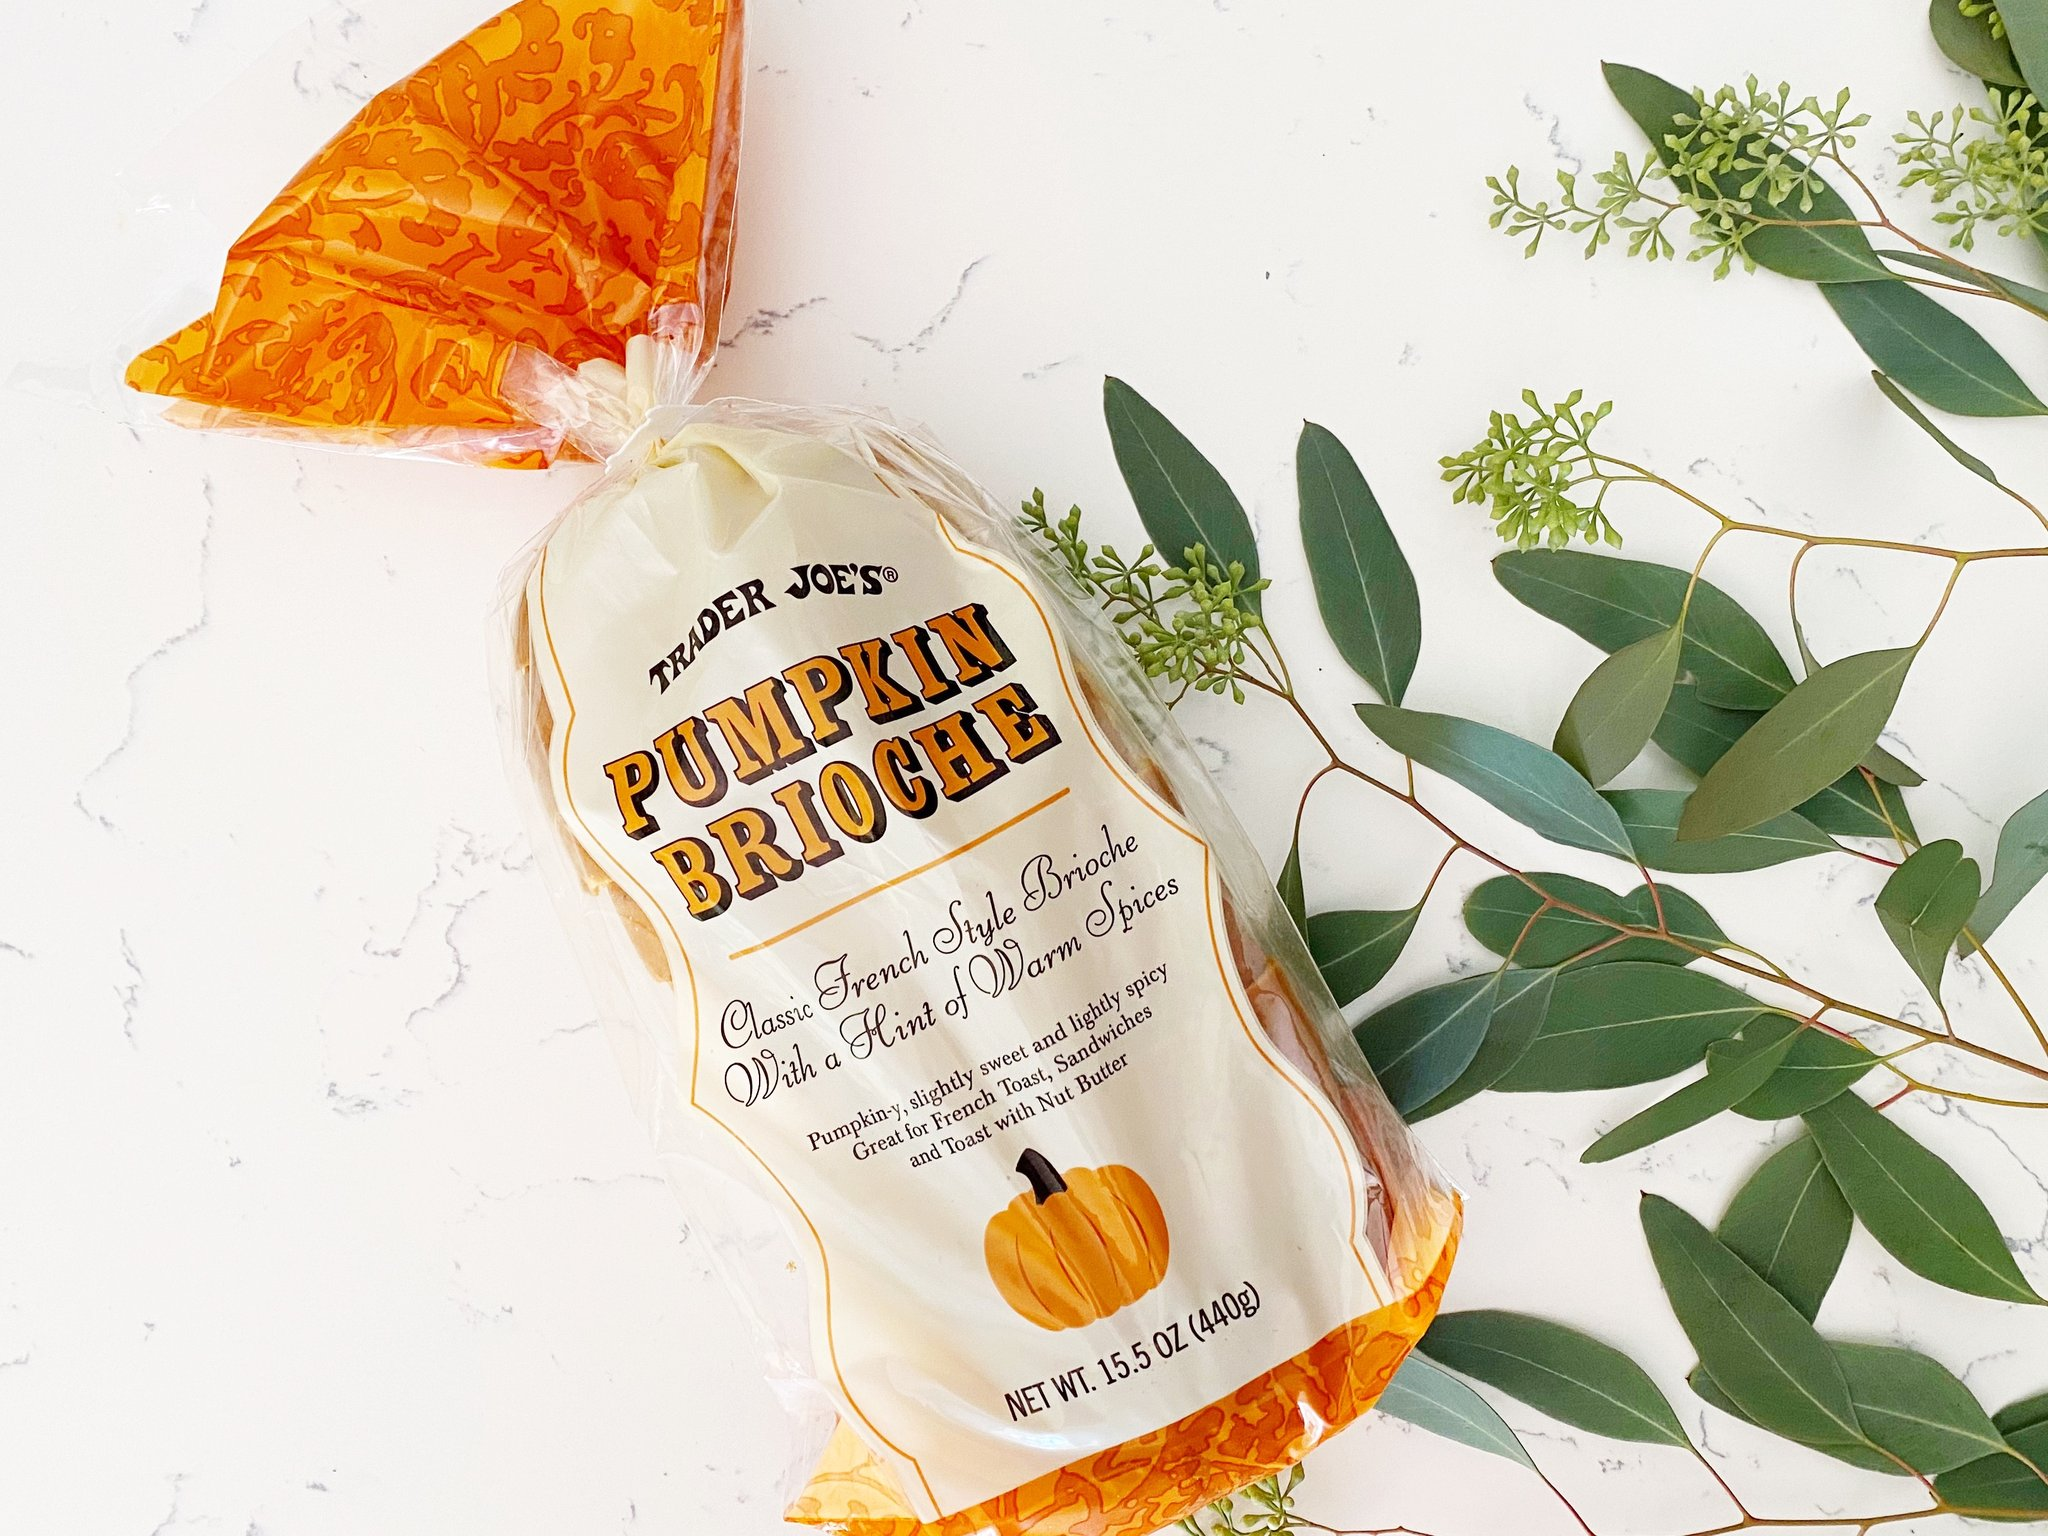 Trader Joe's pumpkin brioche bread